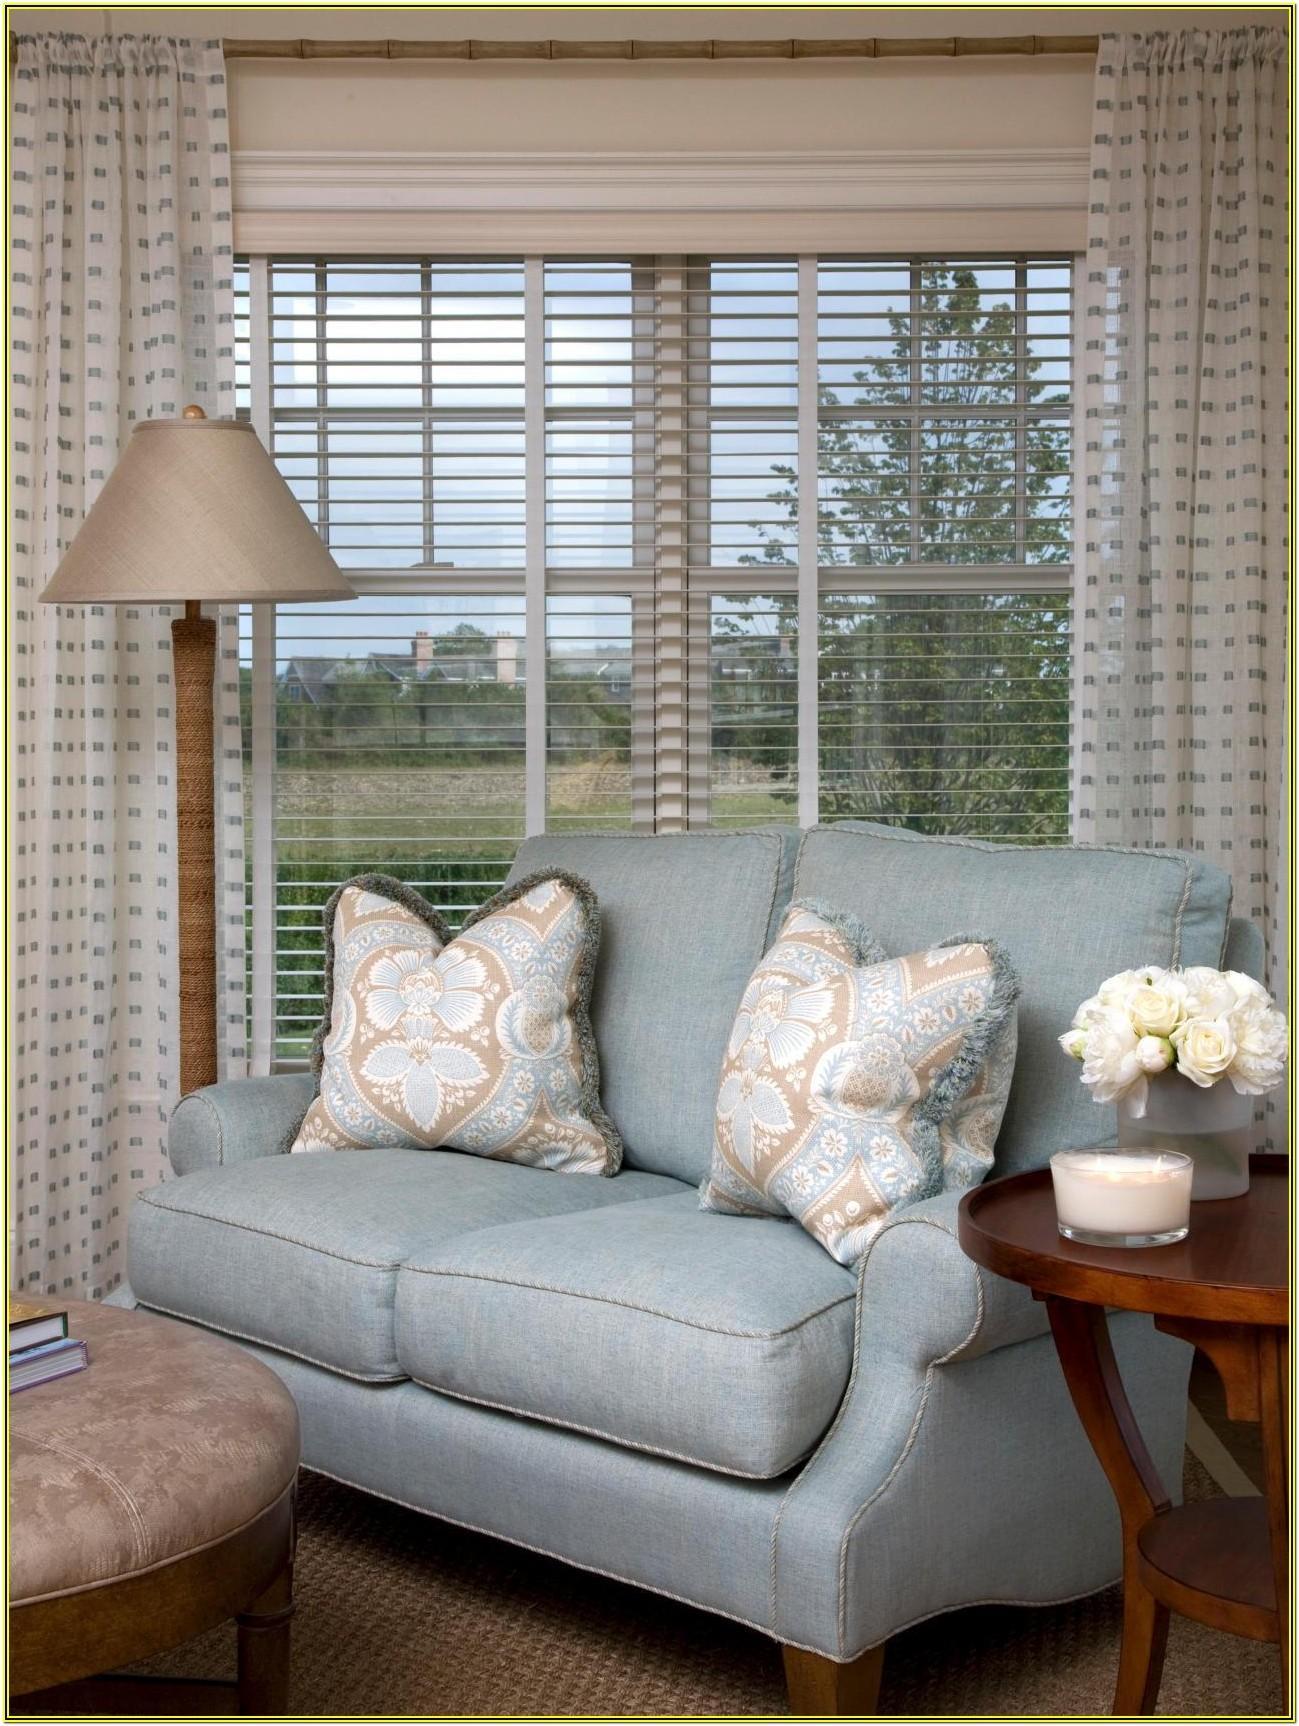 Living Room Window Blinds Ideas